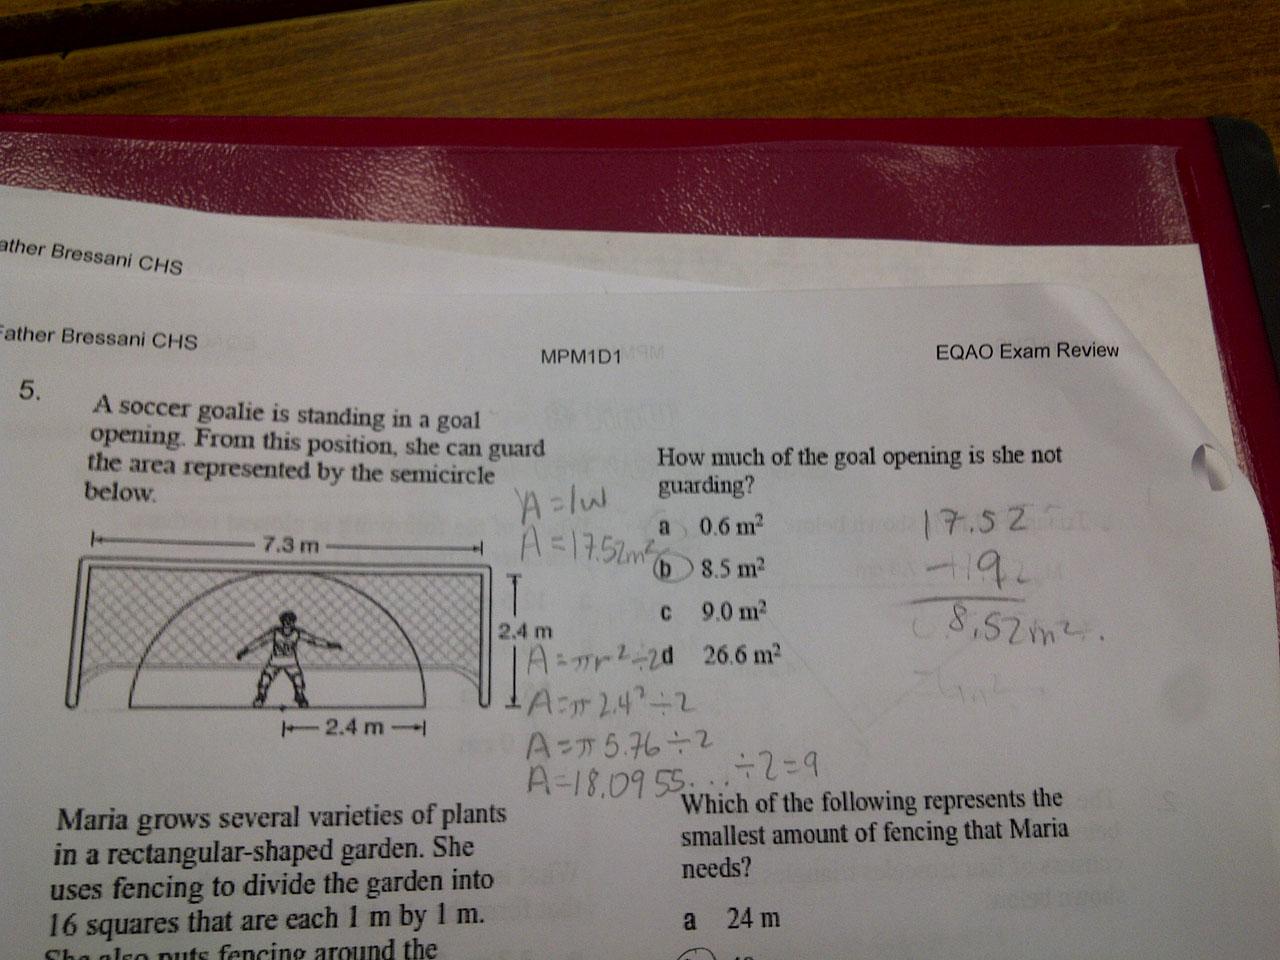 Workbooks nelson math 8 workbook : needmathhelp.com ... grade 9 mathematics ... The path is full of ...